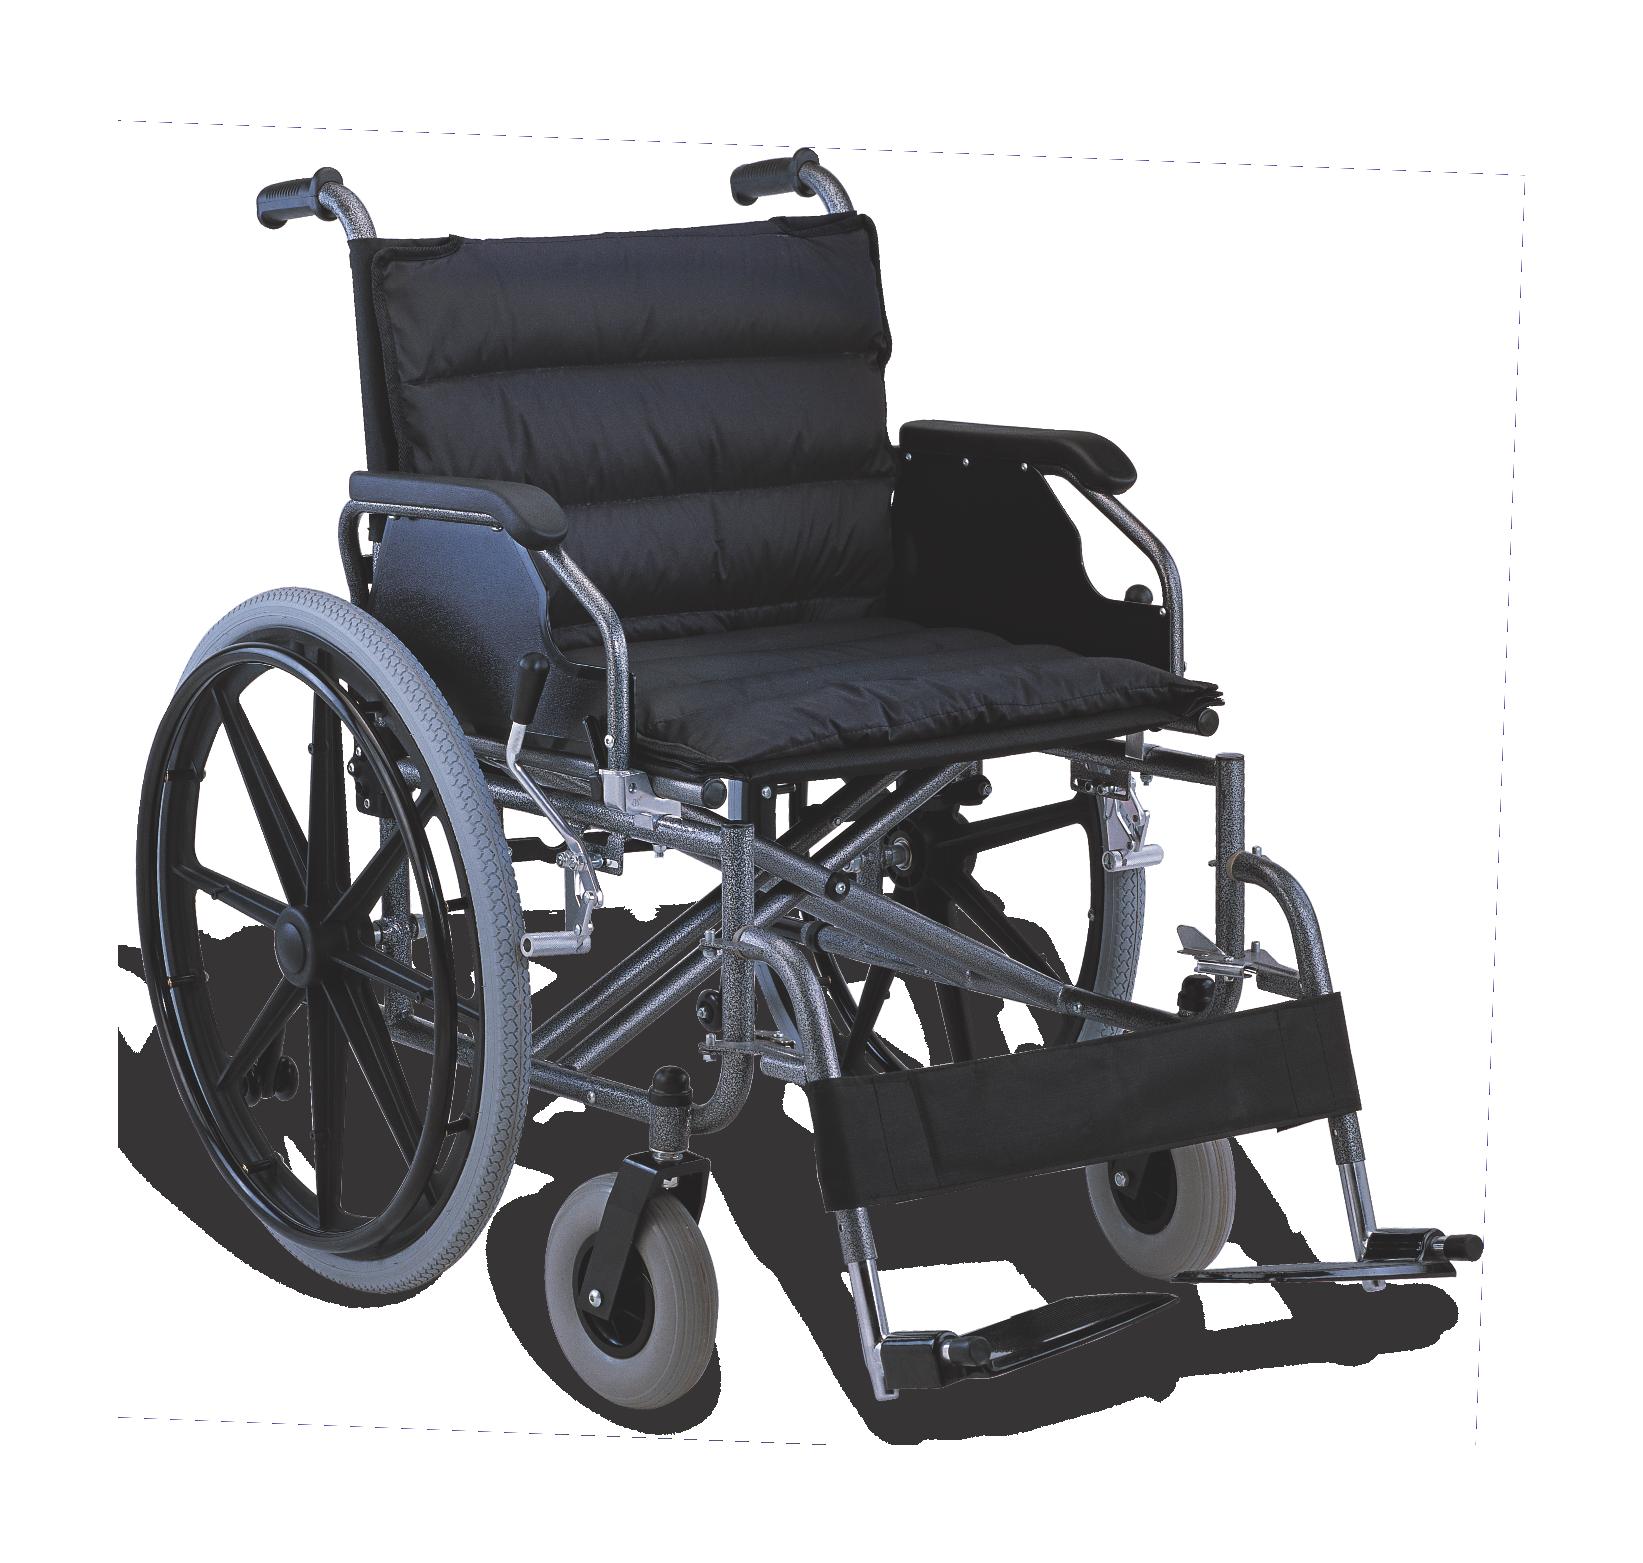 Wheelchair Png Image Wheelchair Chair Steel